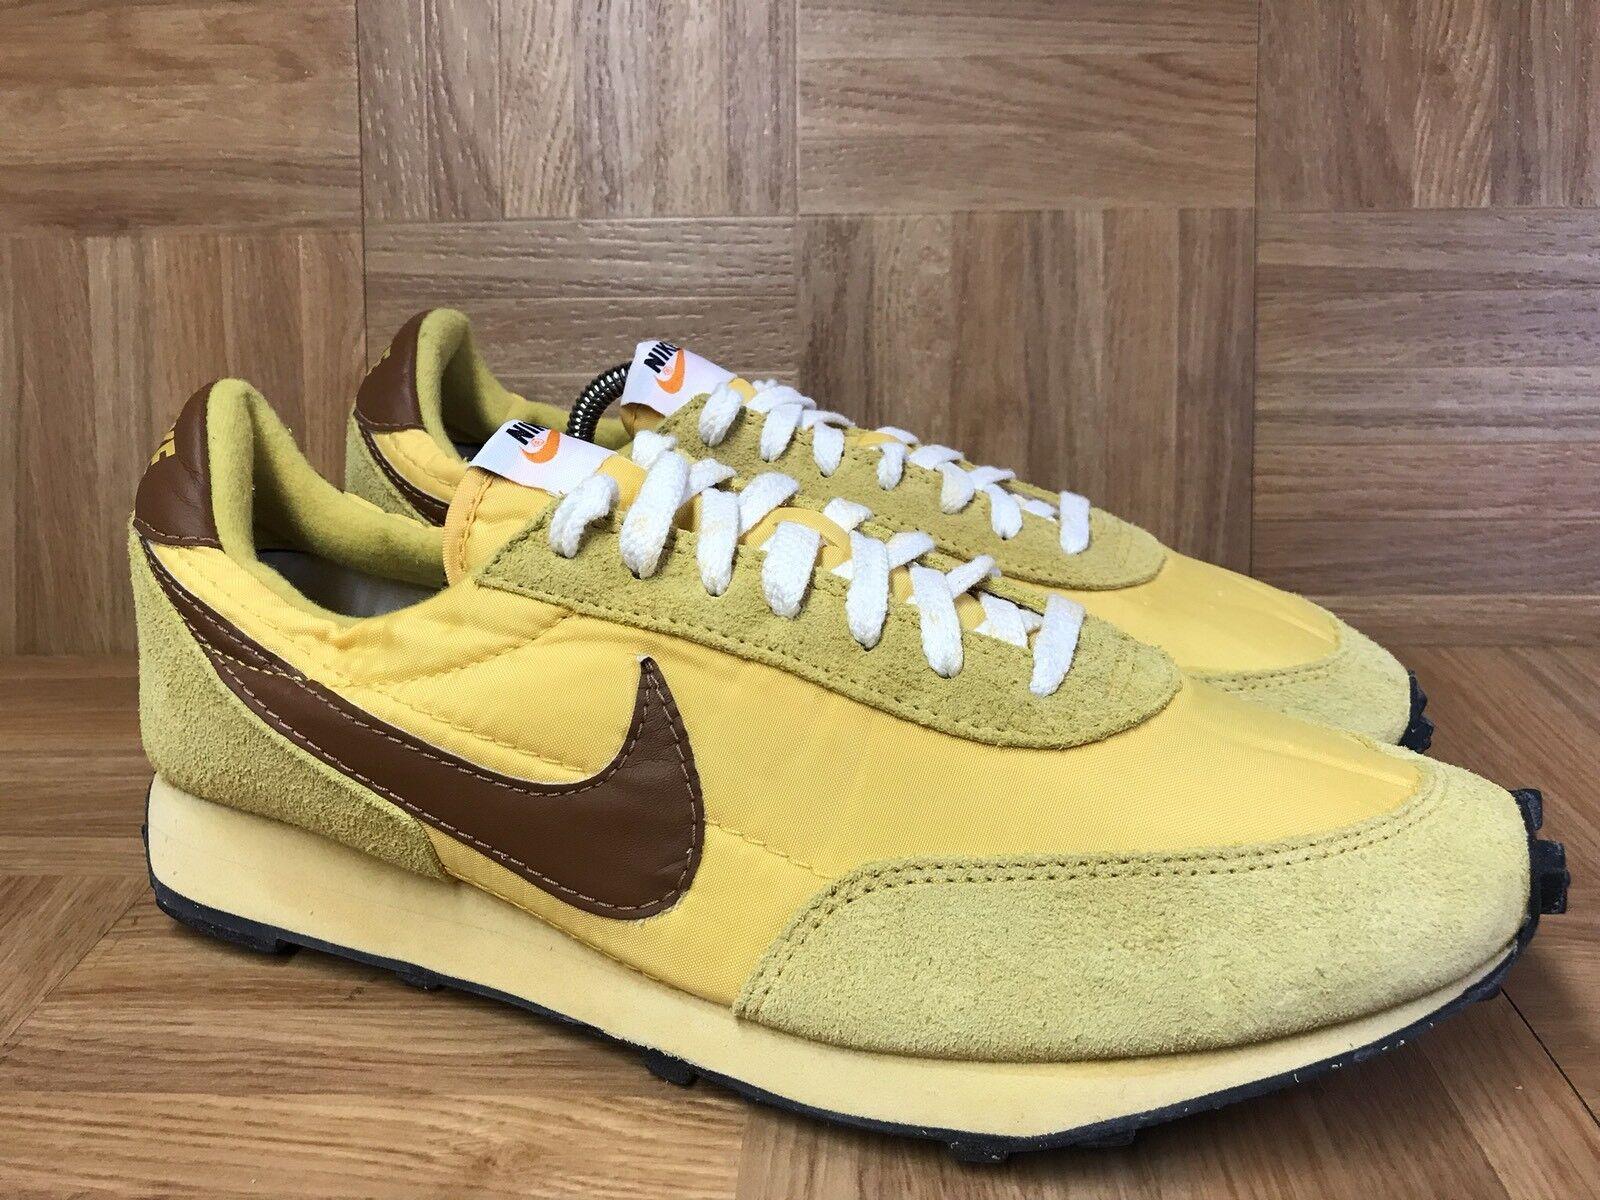 All'alba vntg giallo ocra vintage nike cognac Uomo scarpe sz 316663-721